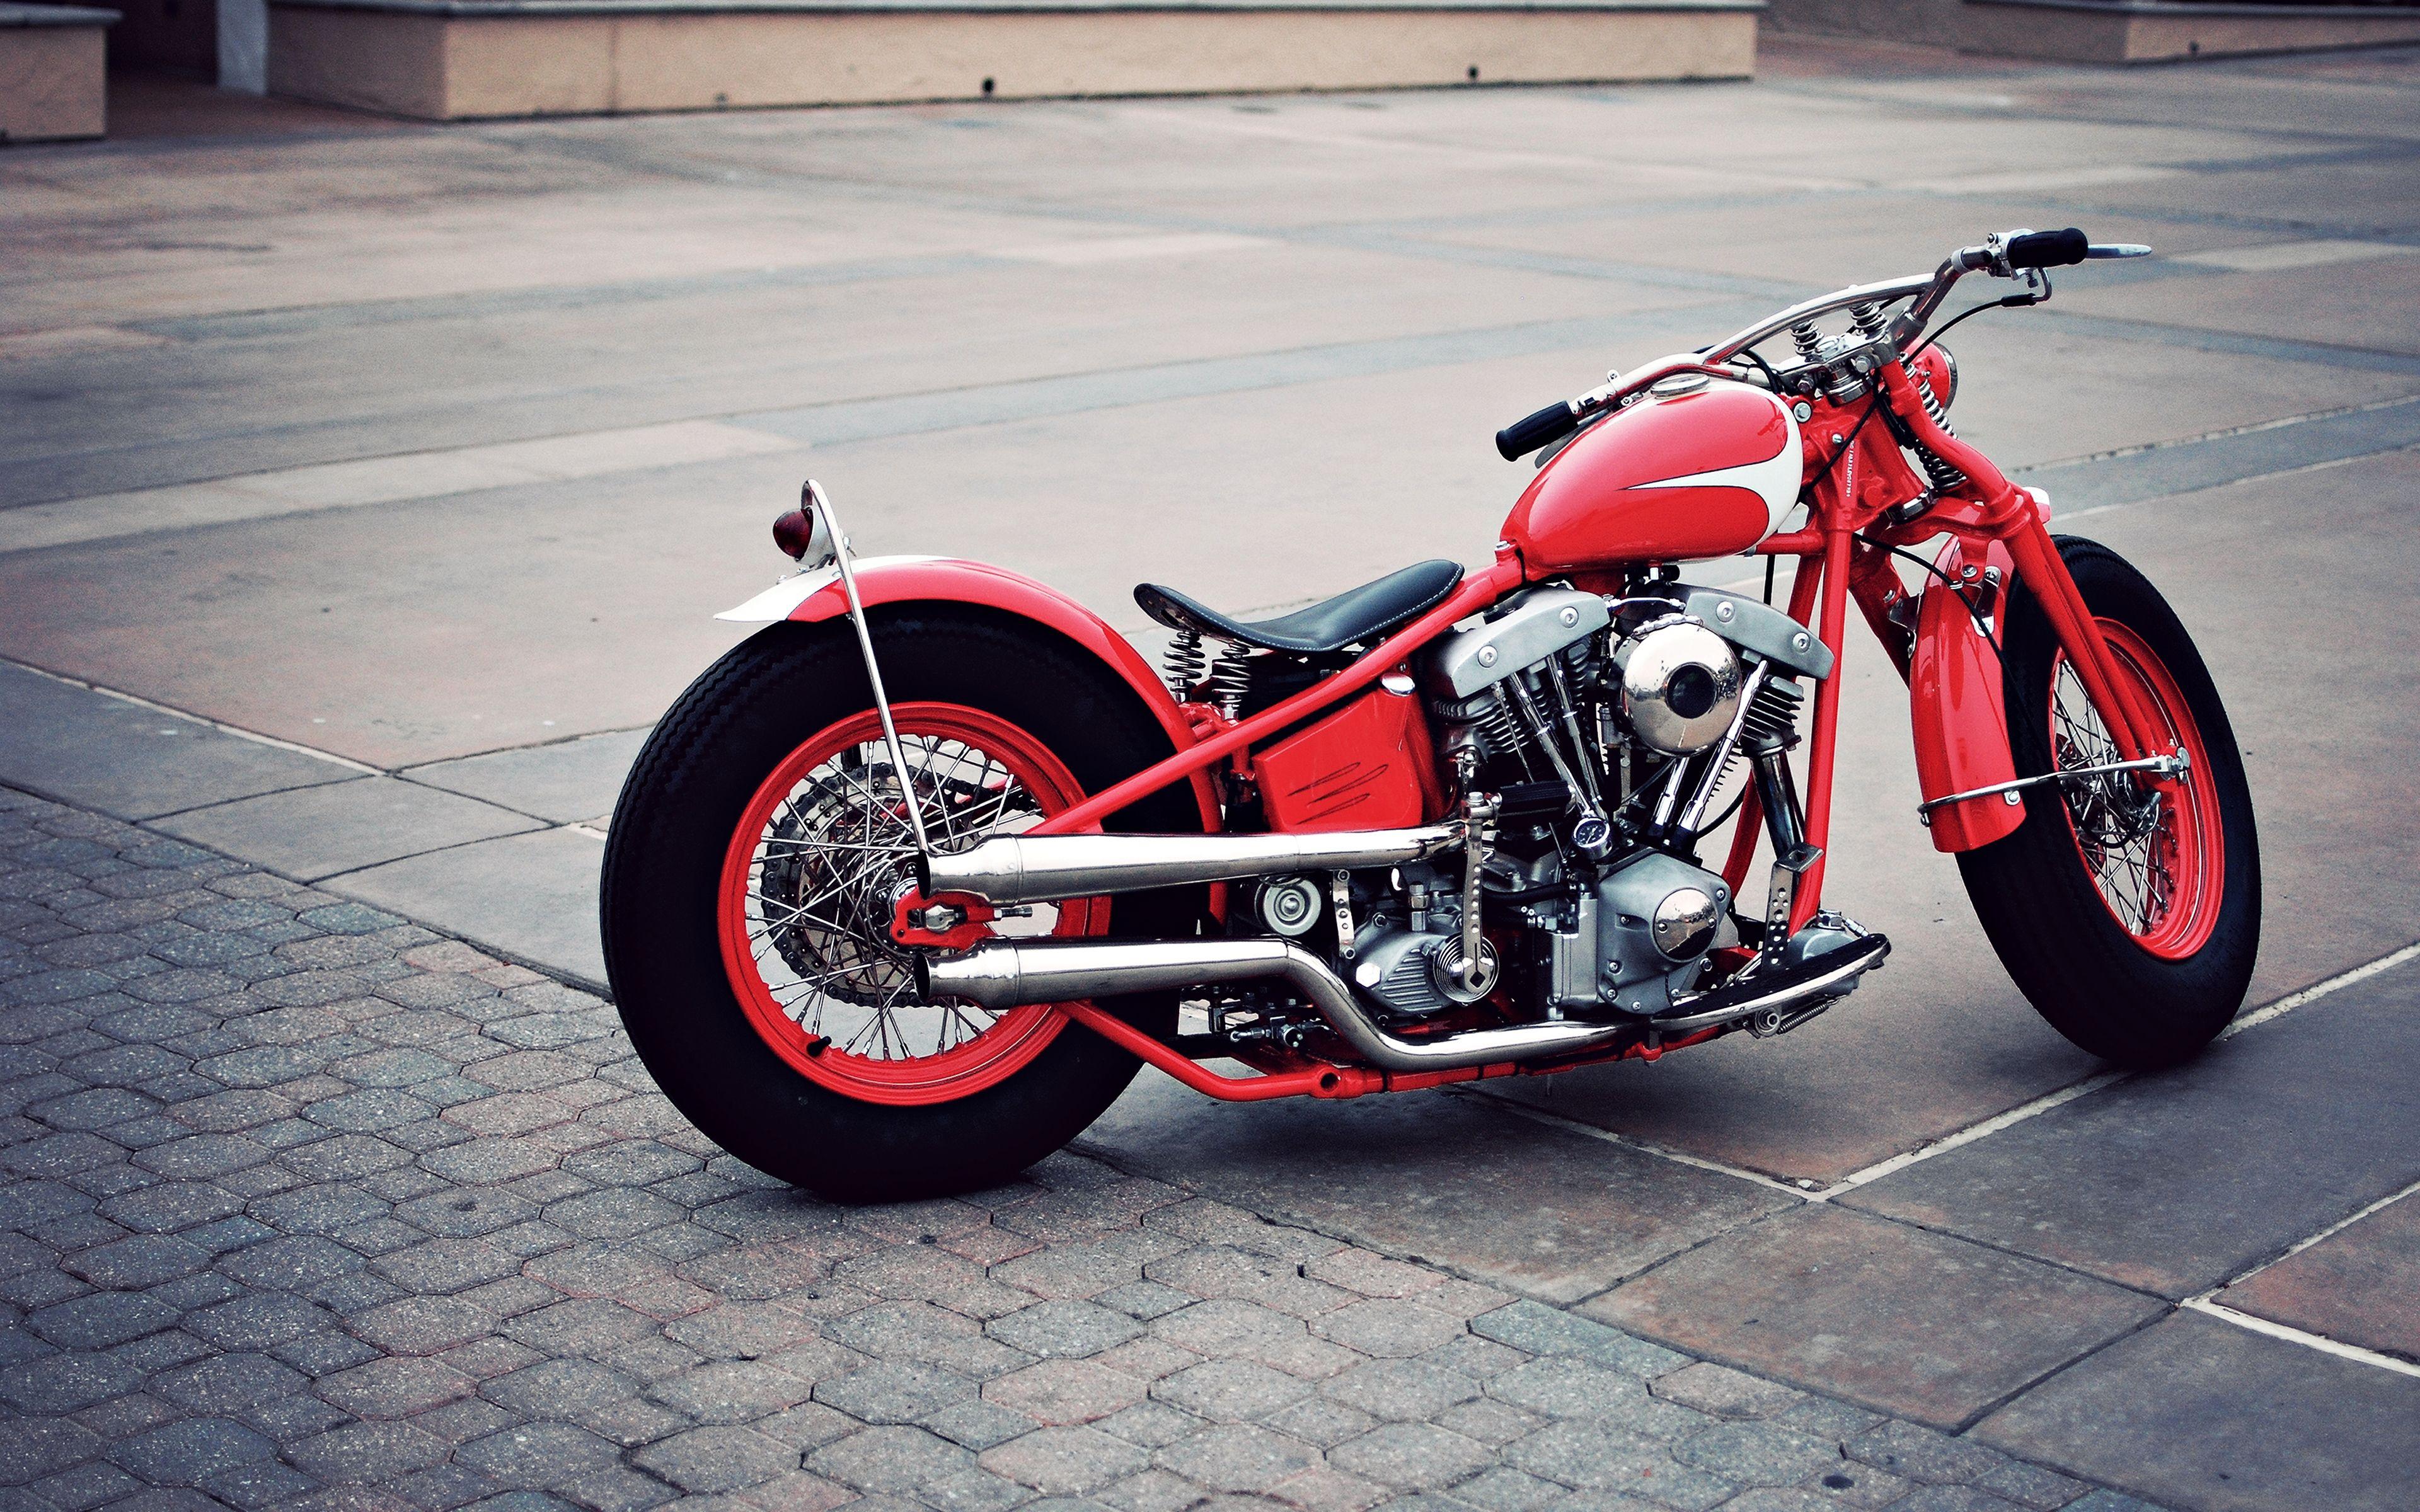 Harley Davidson 4k Ultra Hd Wallpaper Background Image 270 Harleydavidson Hd Wallpapers Background Images 270 Harleydavidso Motorrad Alte Motorrader Bobber